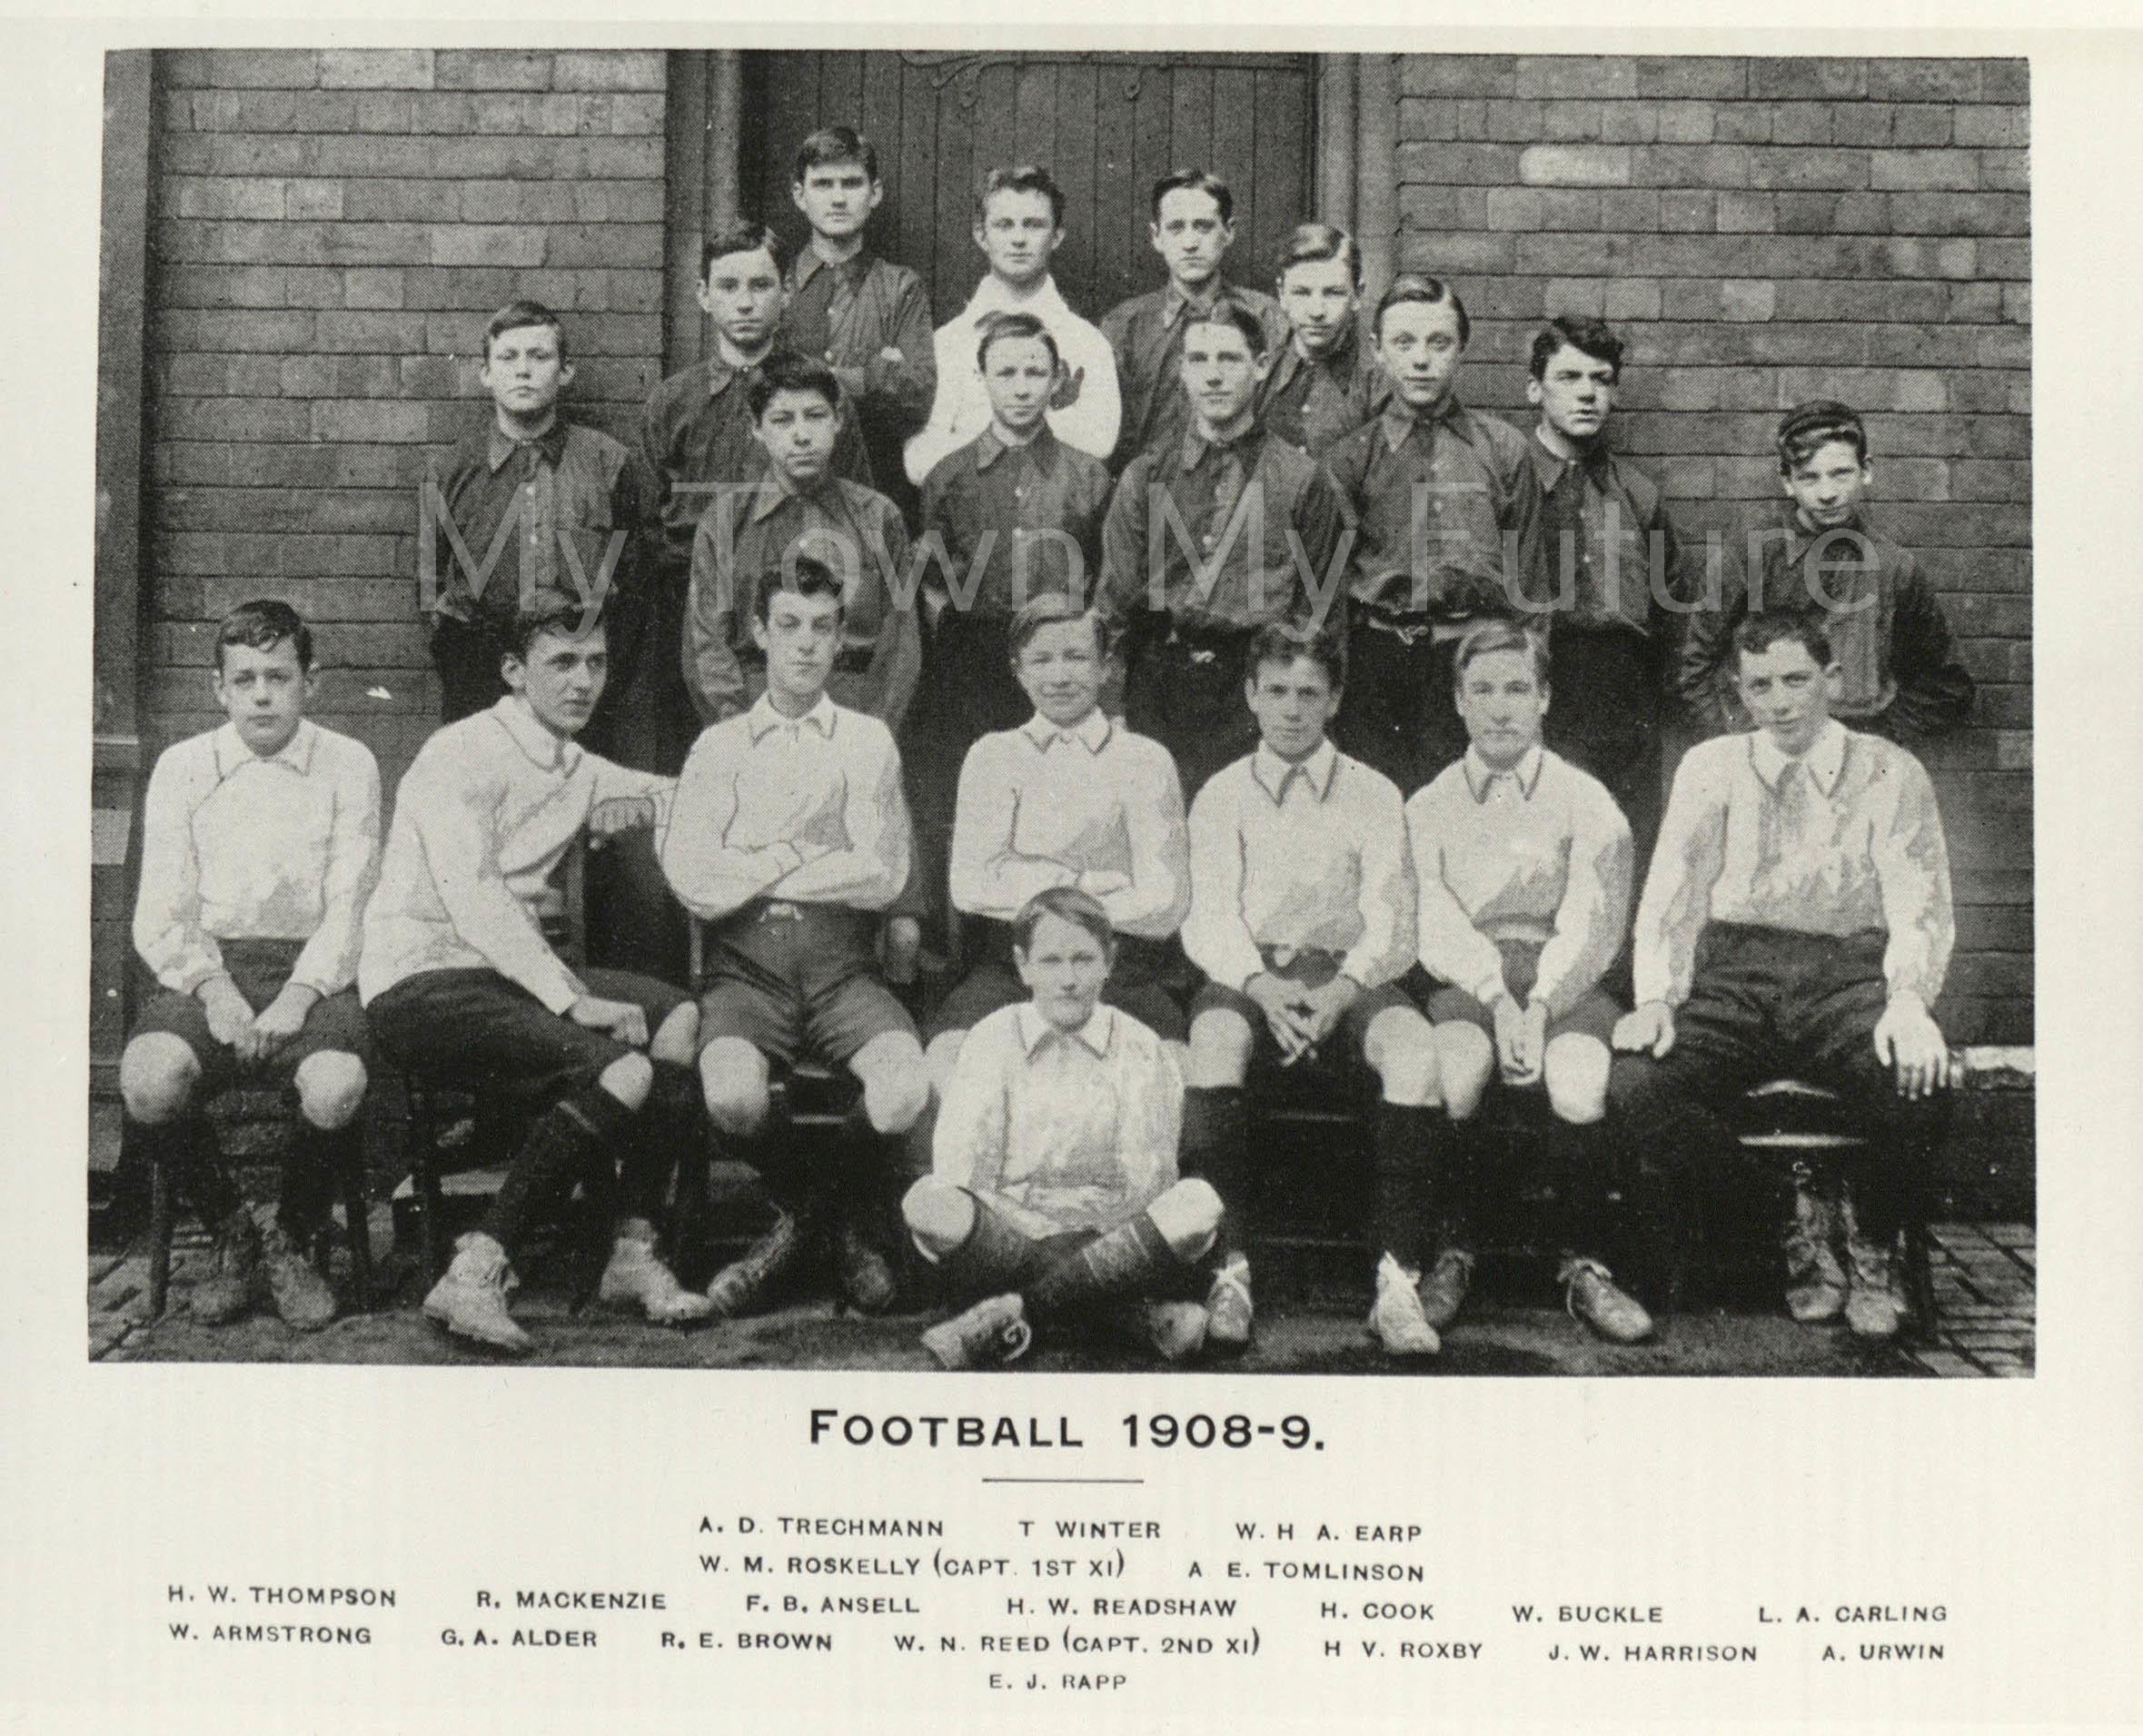 Middlesbrough High School Football Team